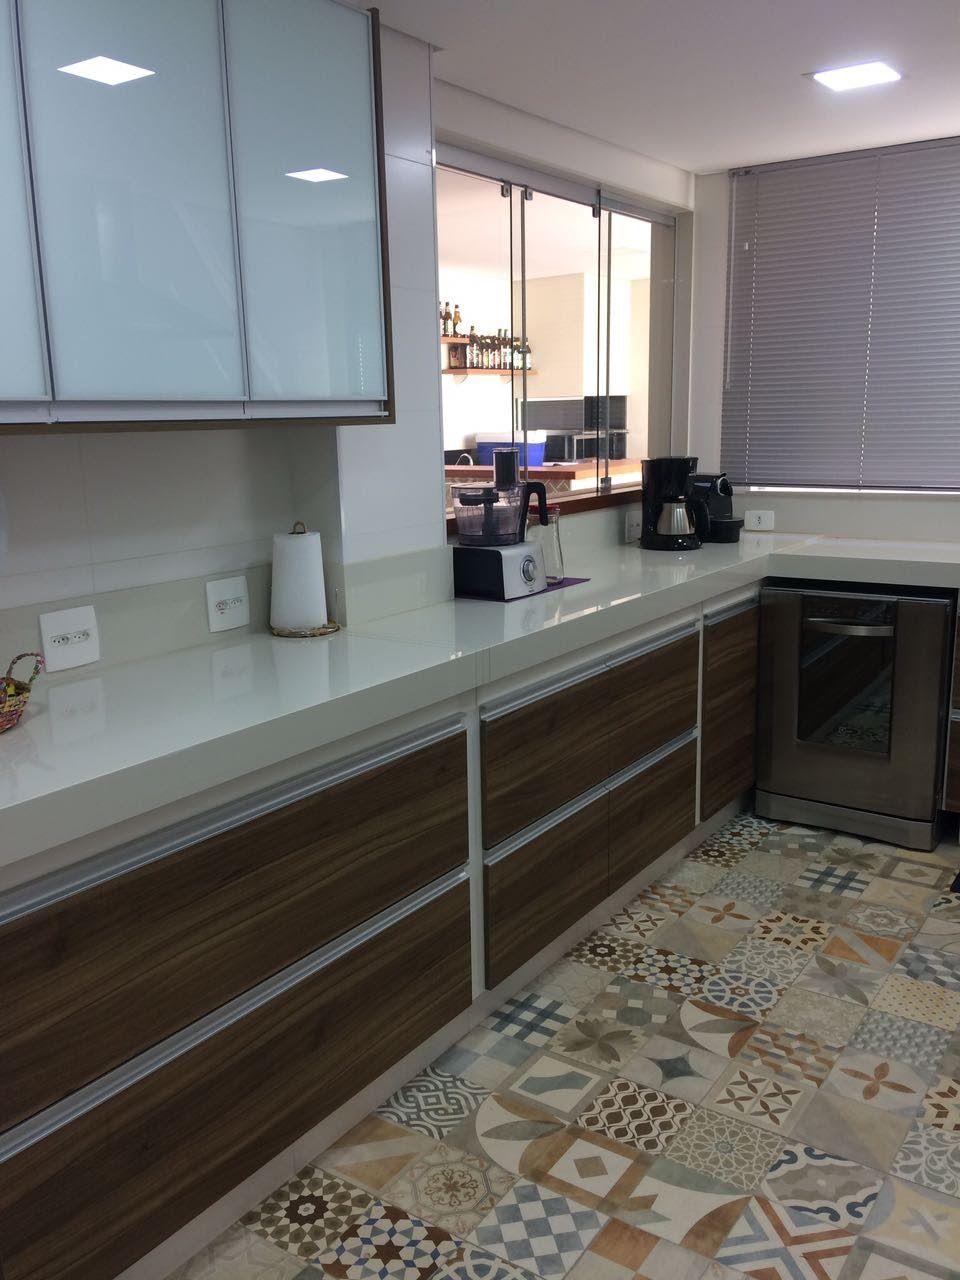 252 - Casa Cond. Vila do Golfe 180 m² (Reserva)